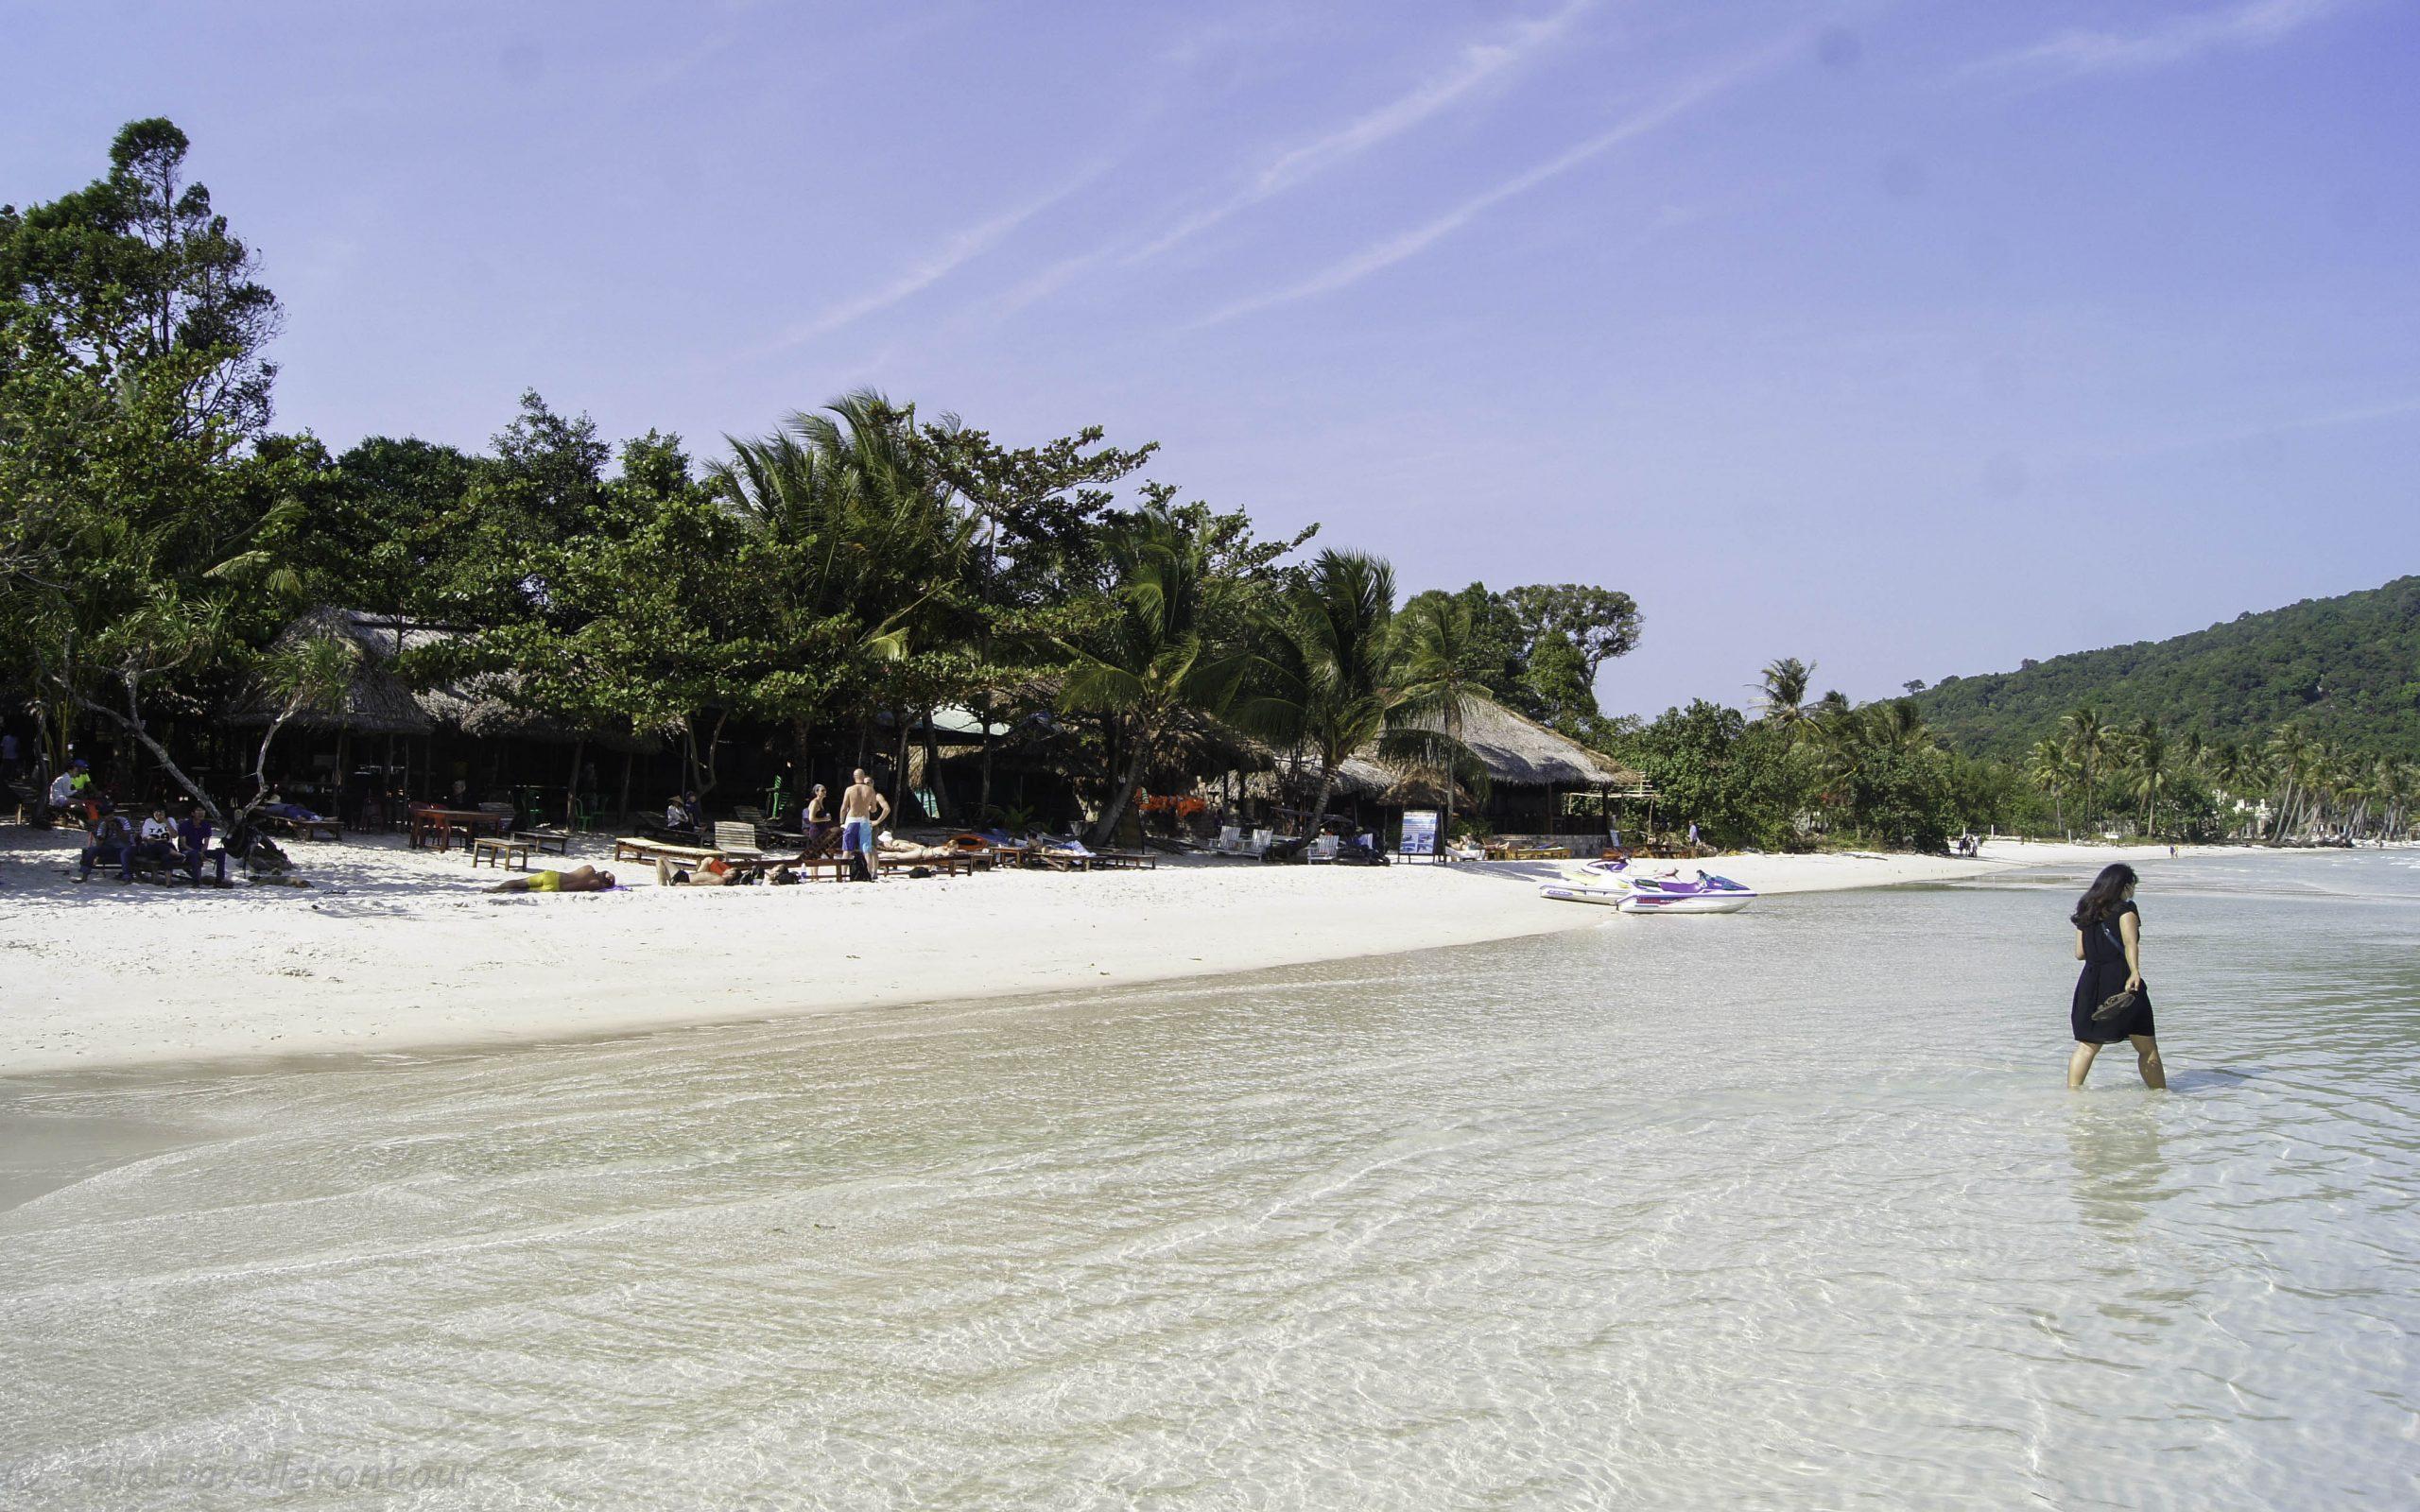 26. Phu Quoc: the beach, blue ocean and bad scallops